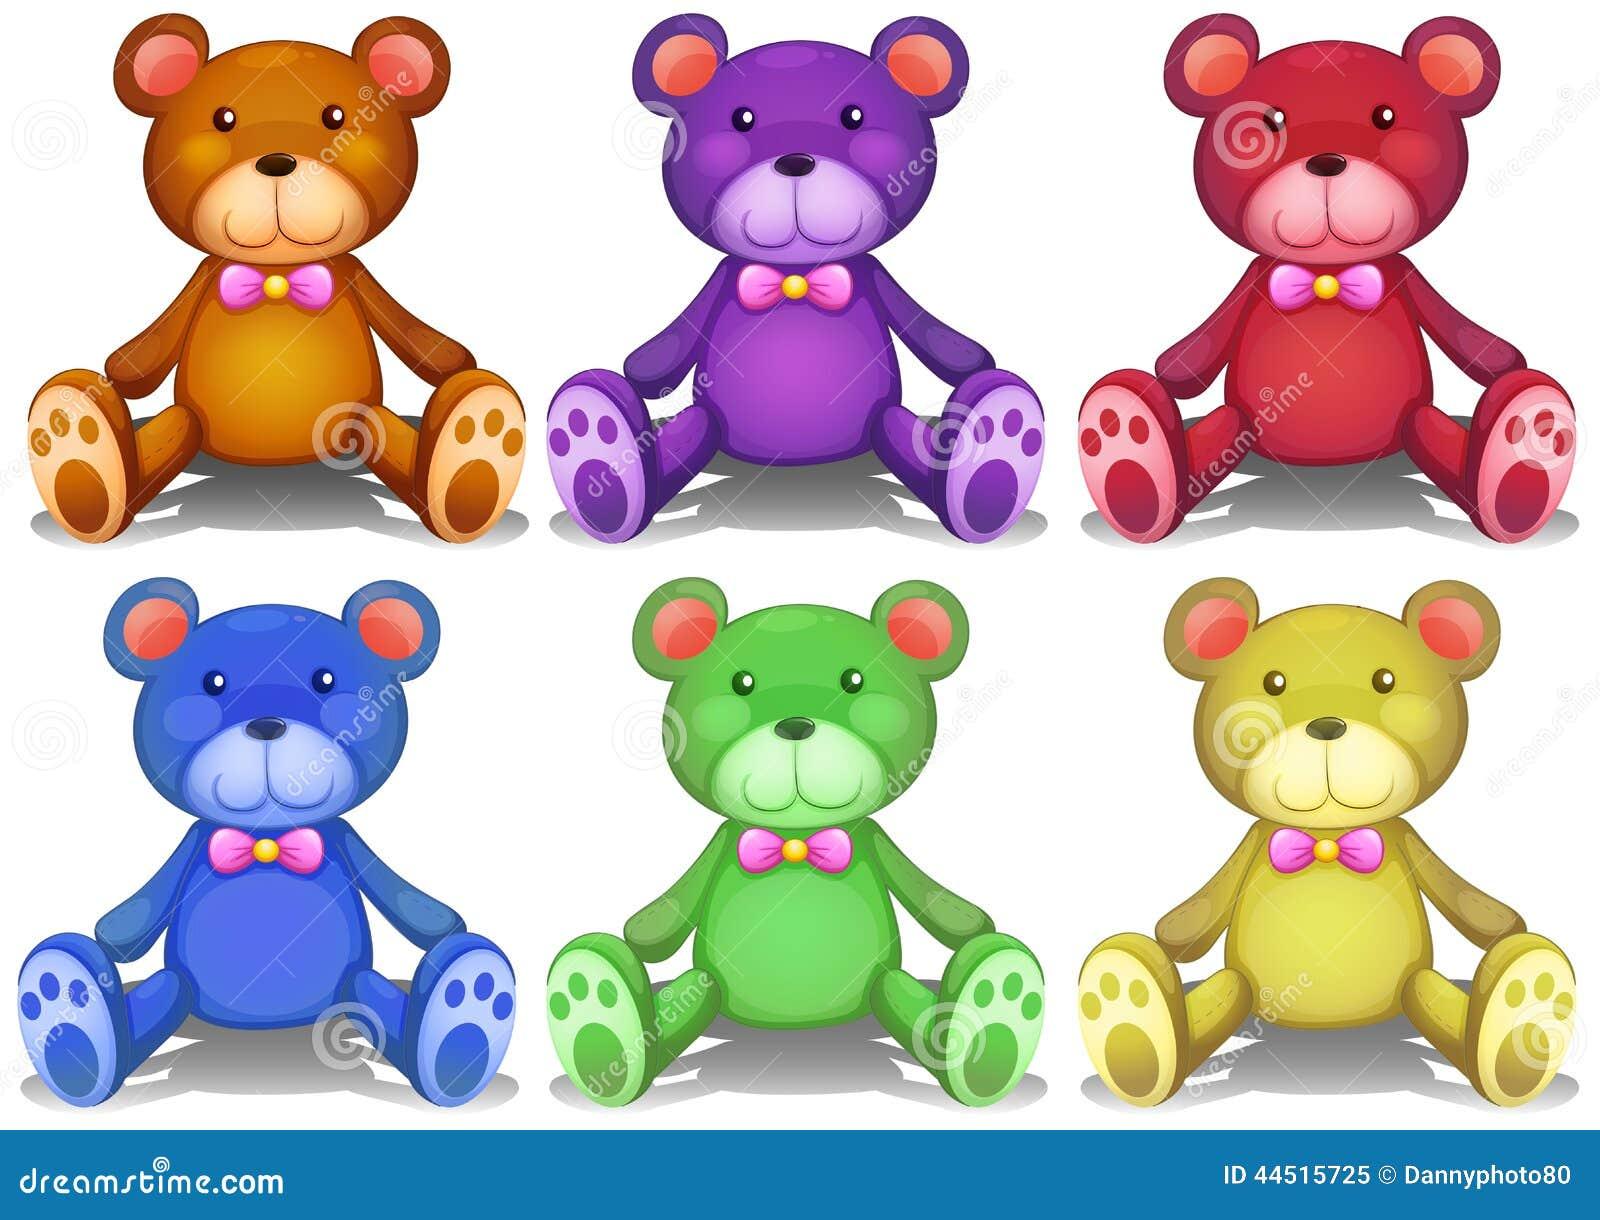 Colorful Teddy Bears Stock Vector - Image: 44515725 - photo#22